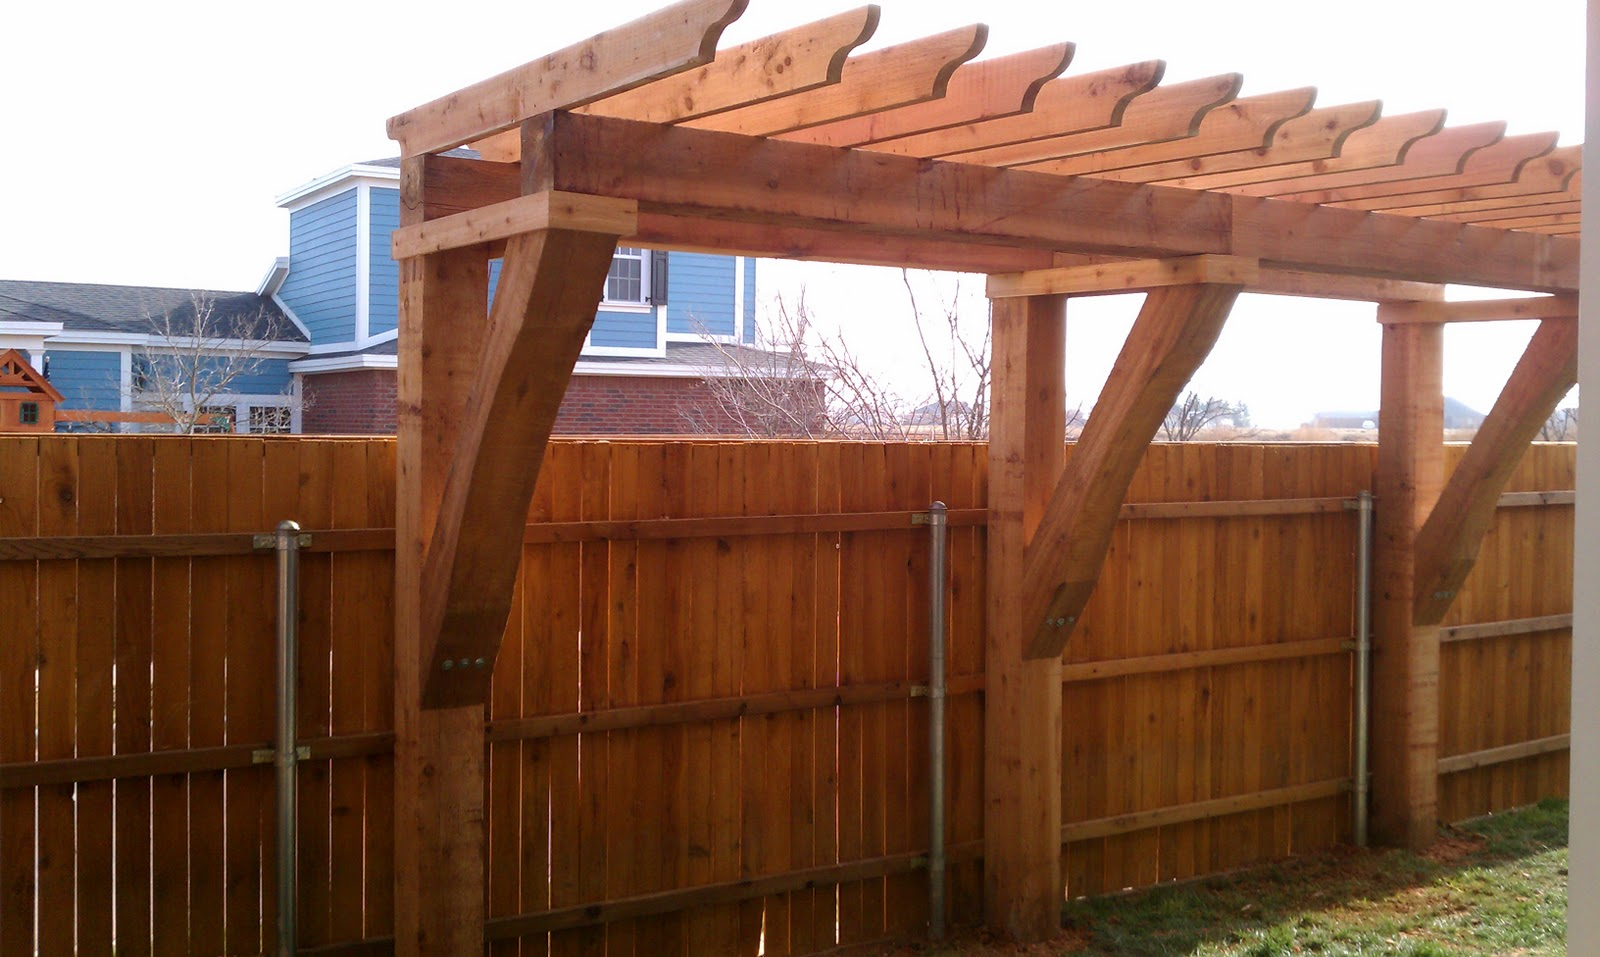 Pergolas, Arbors and Decks in Lubbock, TX: Sideyard ... on Side Yard Pergola Ideas id=14788